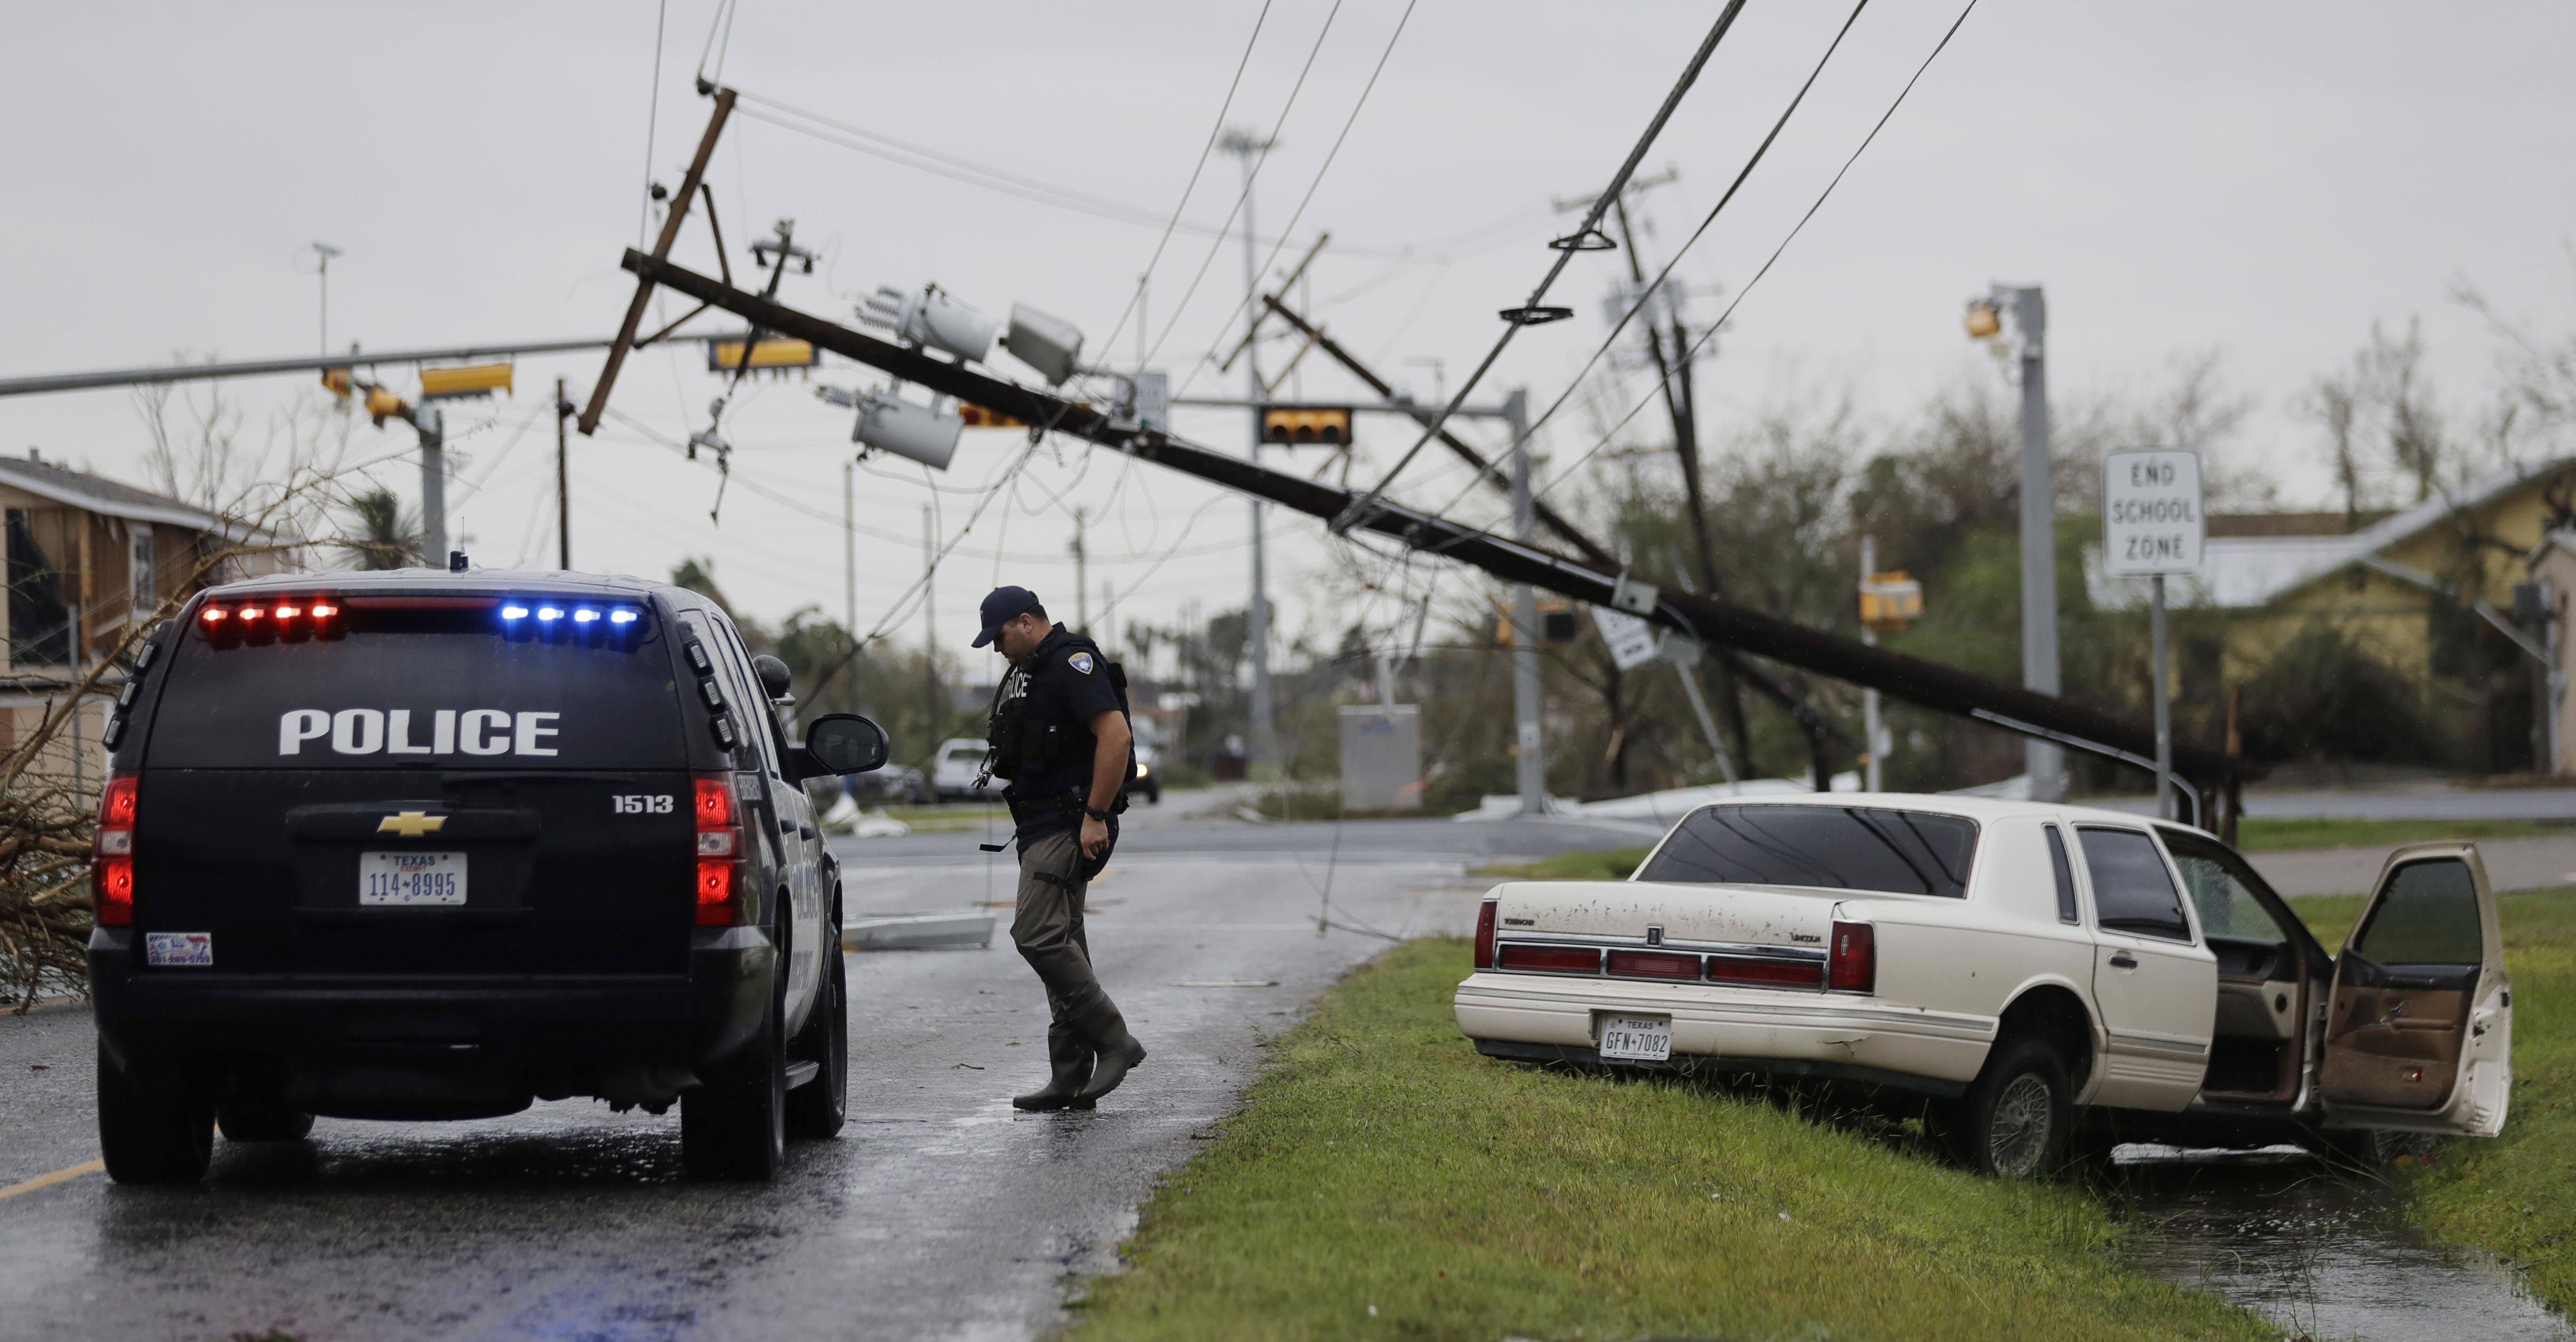 Police officer checks abandoned cars during Hurricane Harvey